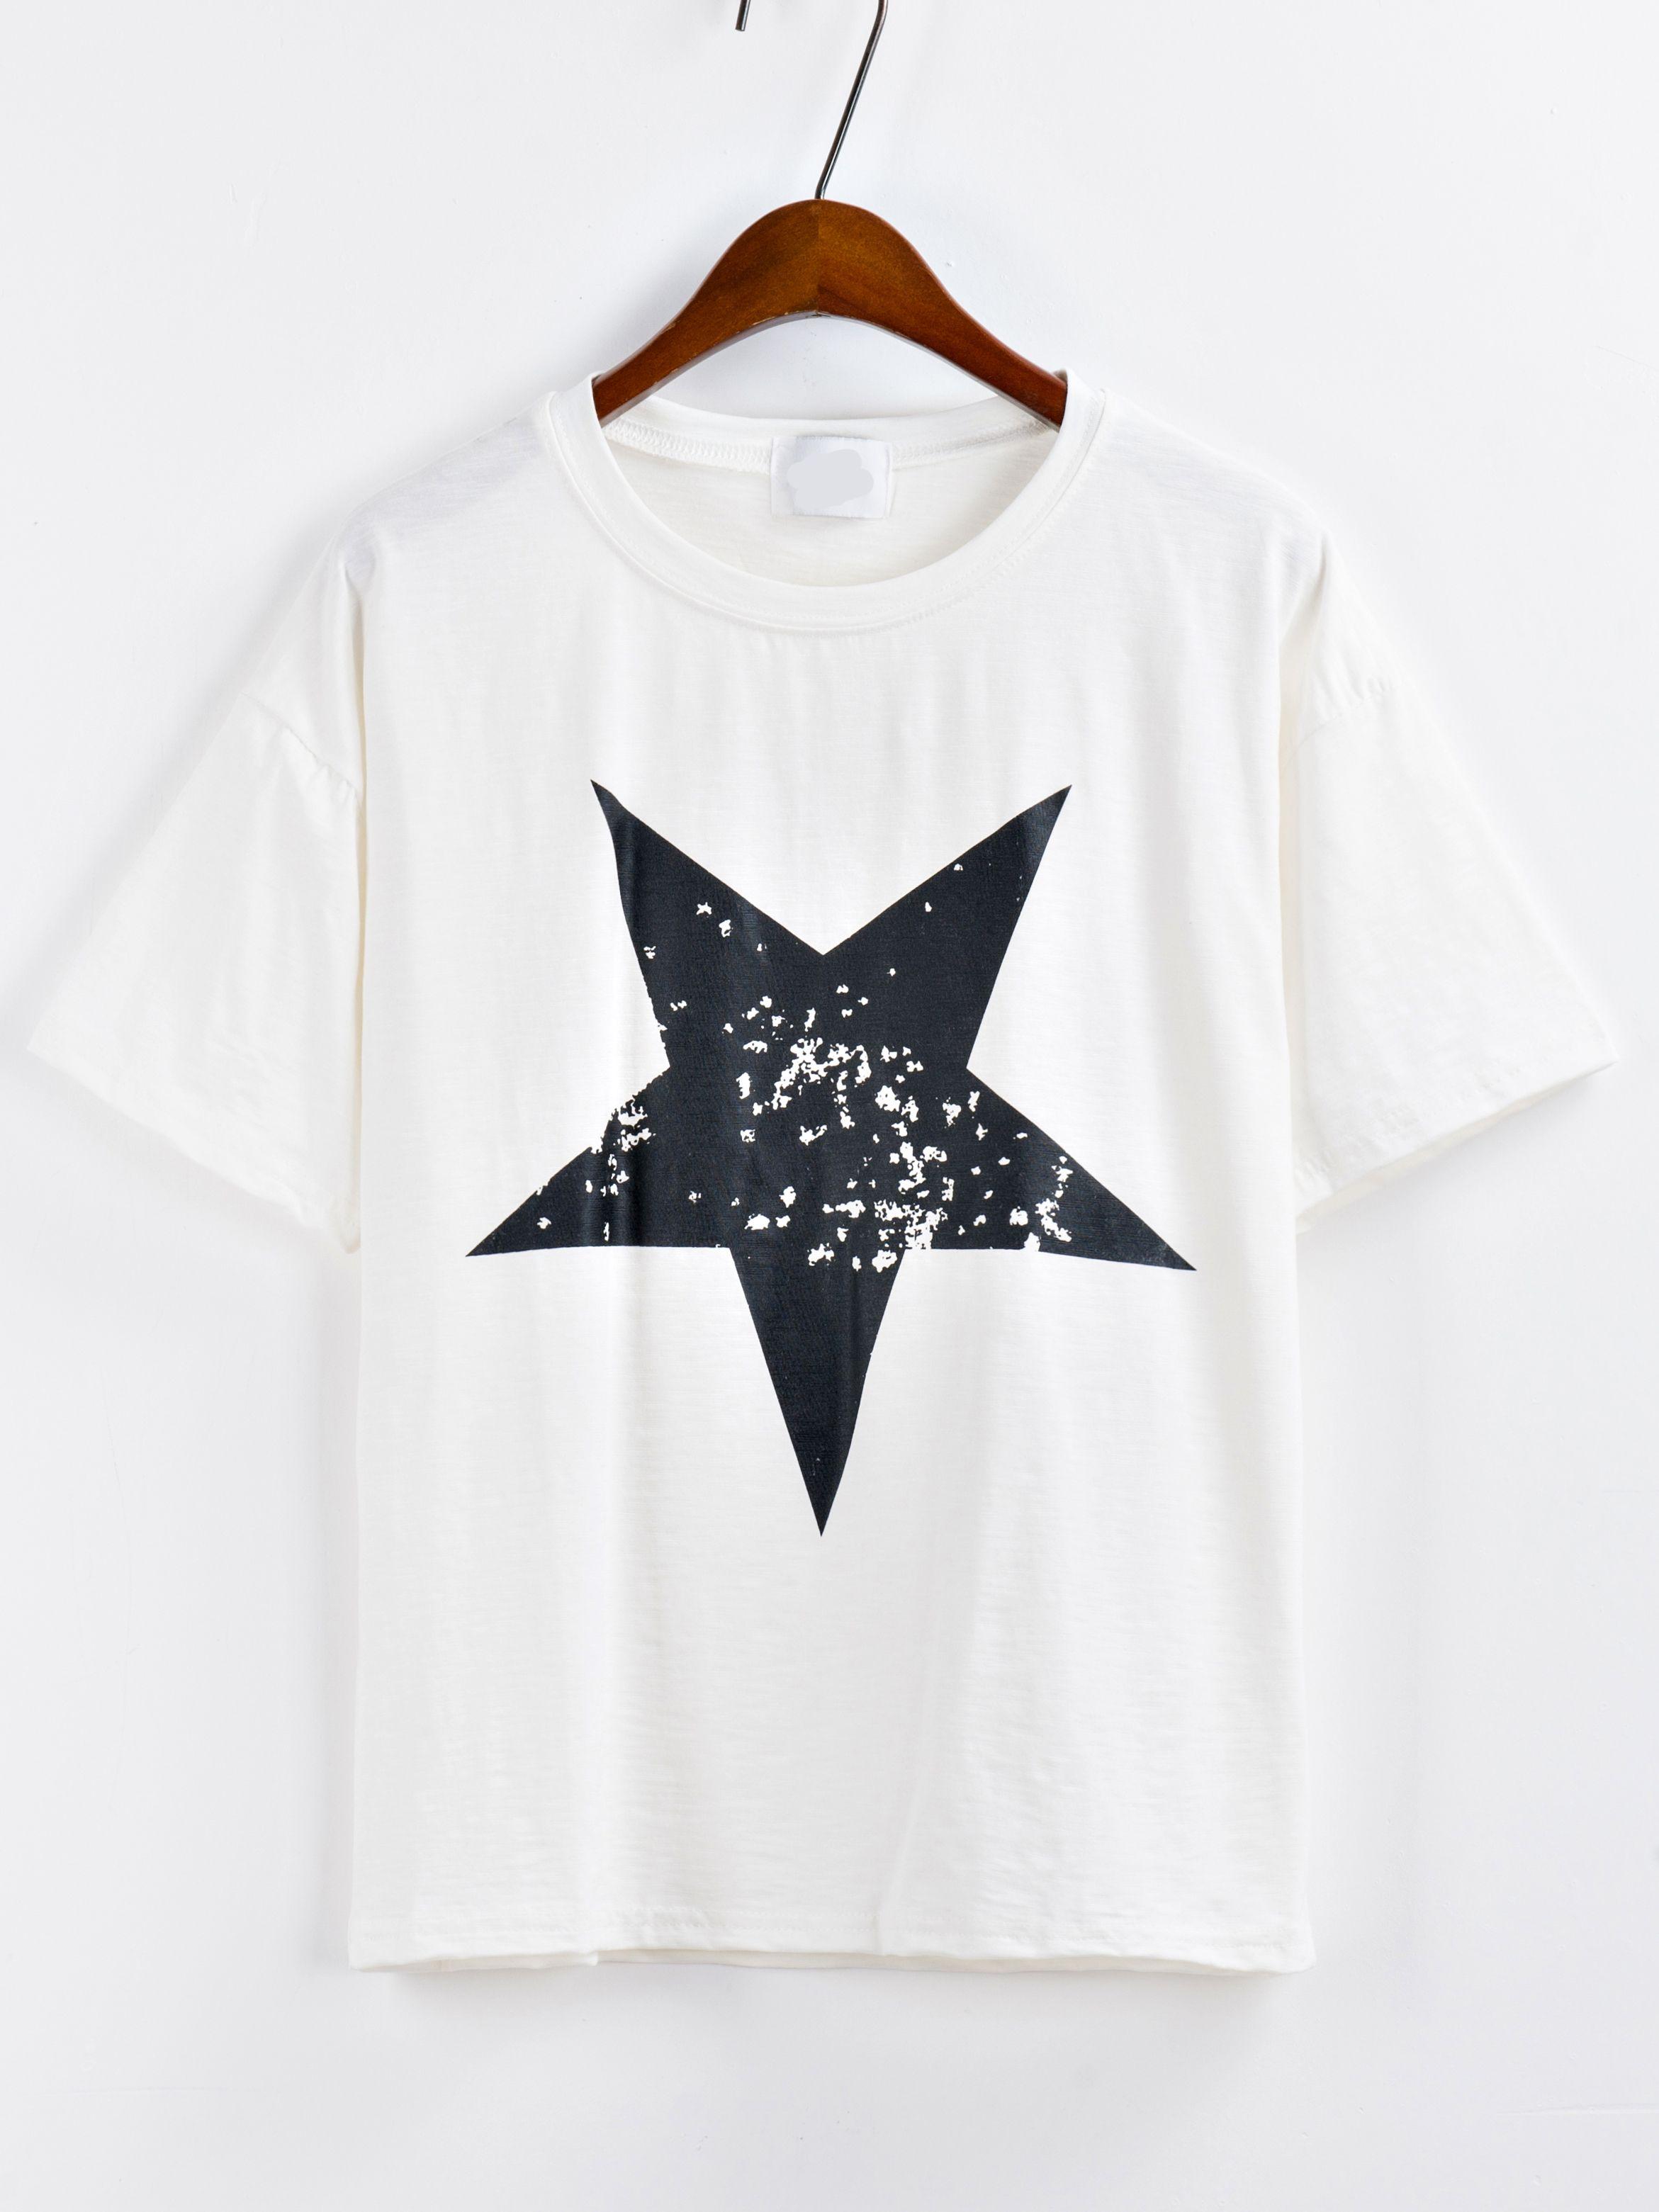 8ebcf23e15 Shop Star Print White T-shirt online. SheIn offers Star Print White T-shirt  & more to fit your fashionable needs.